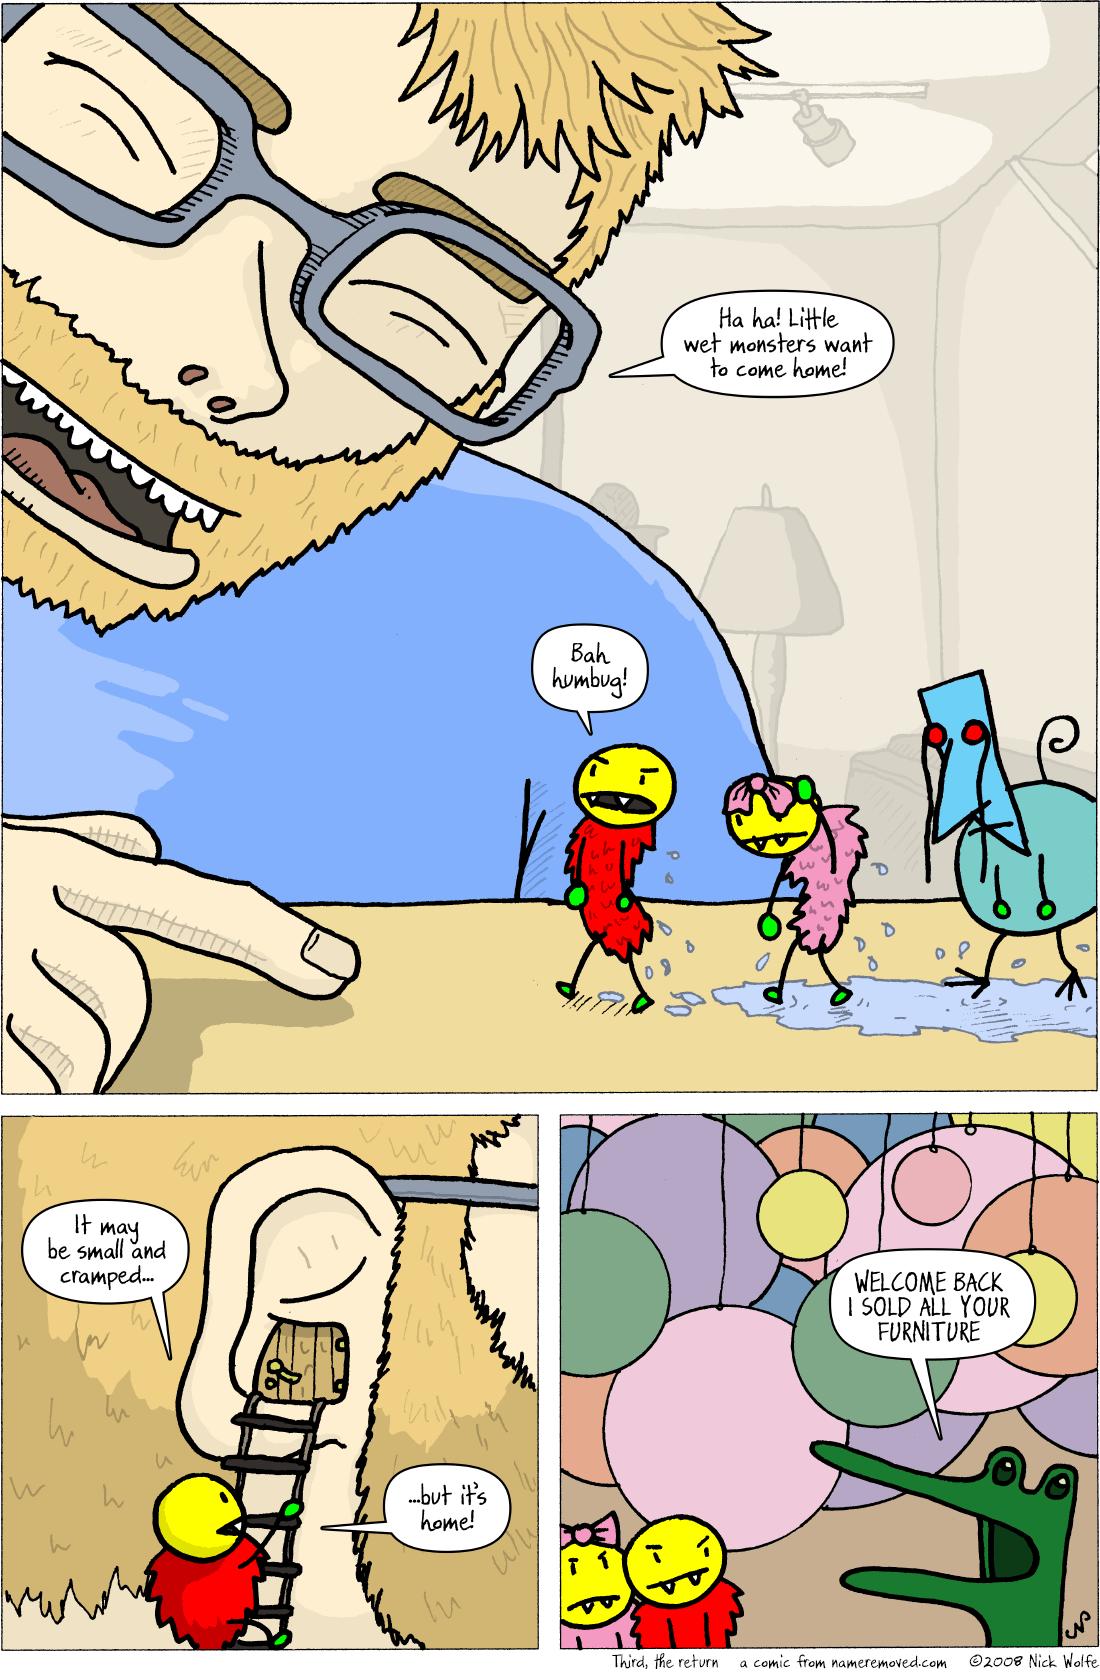 Third, the return